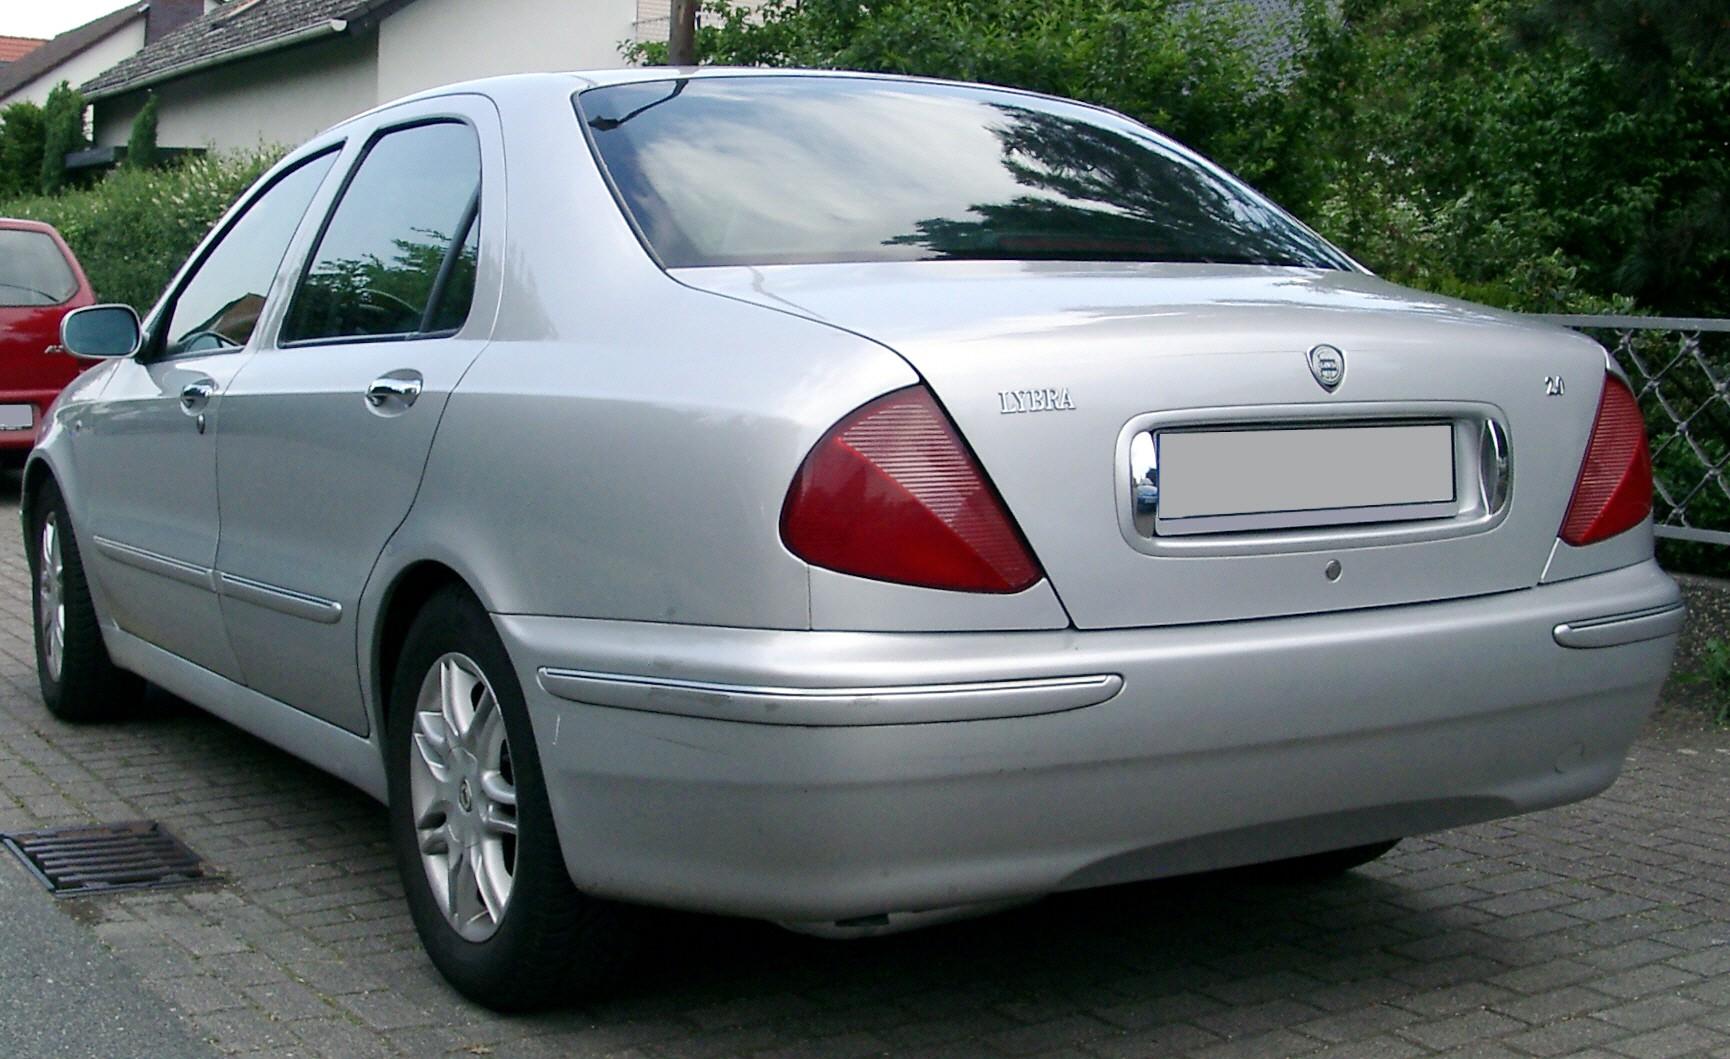 Lancia Lybra on 1999 Acura Cl Coupe